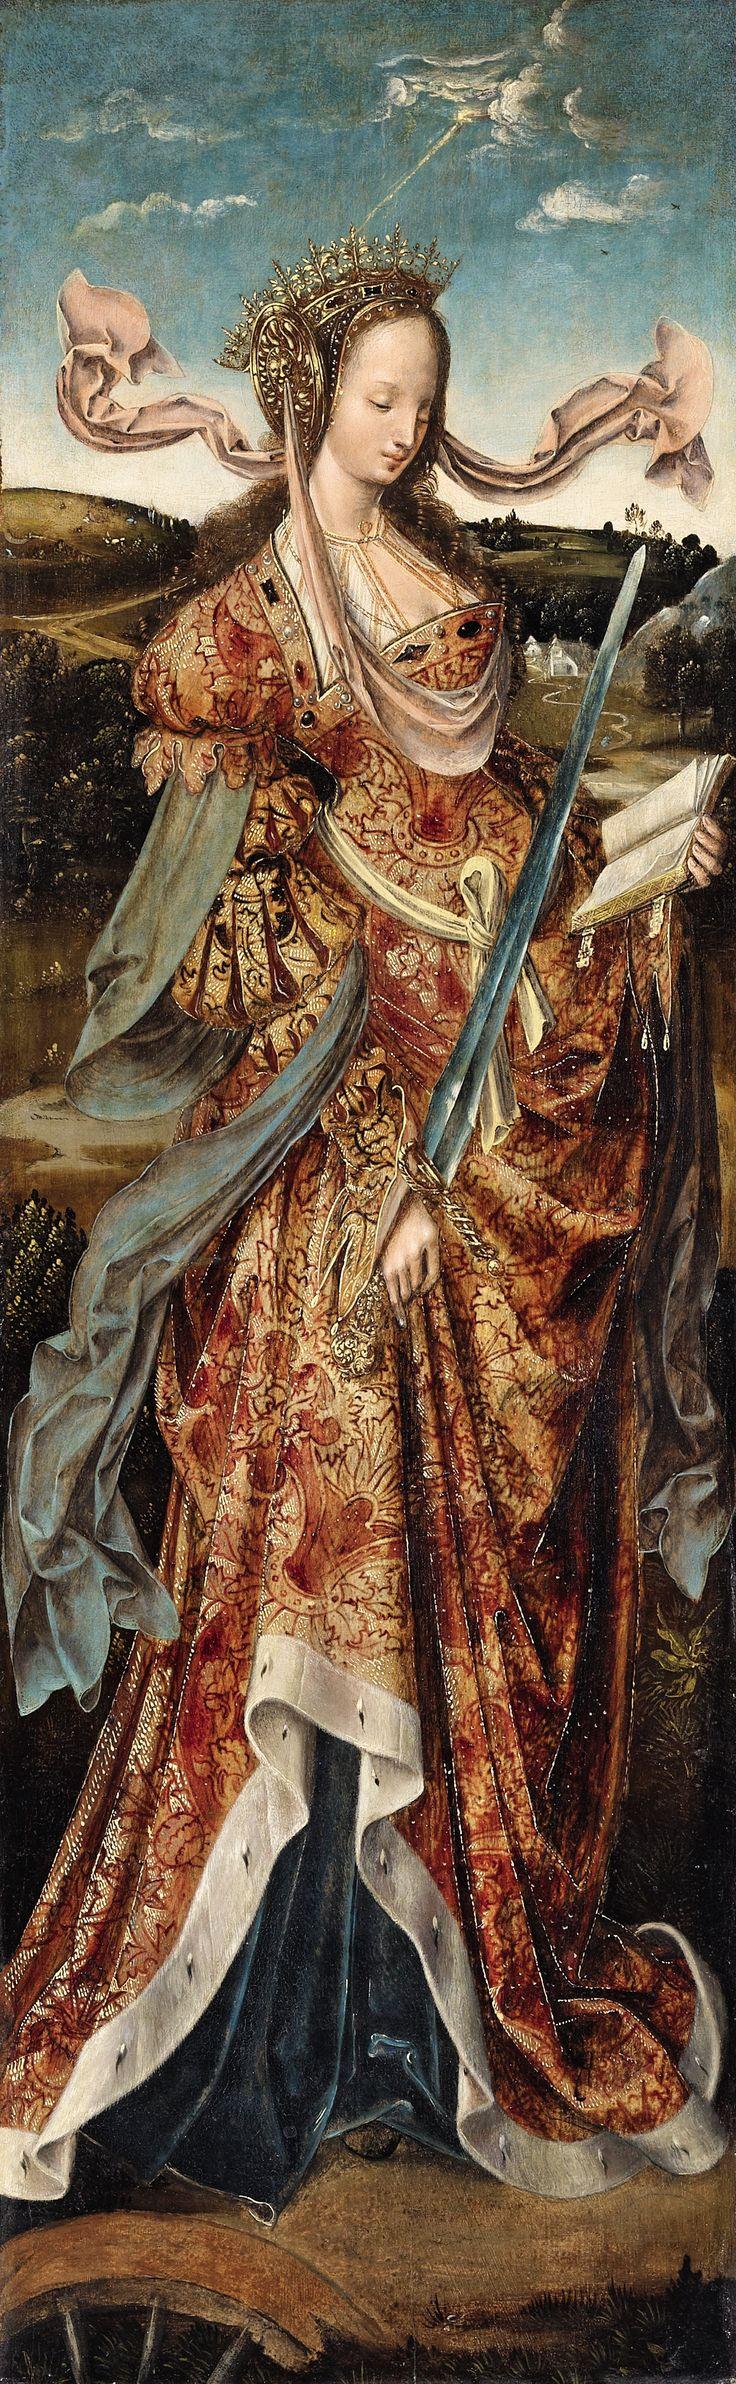 Cornelis Engebrechtsz, Saint Barbara and Saint Catherine, Auction 1029 Old Masters and 19th Century, Lot 1018